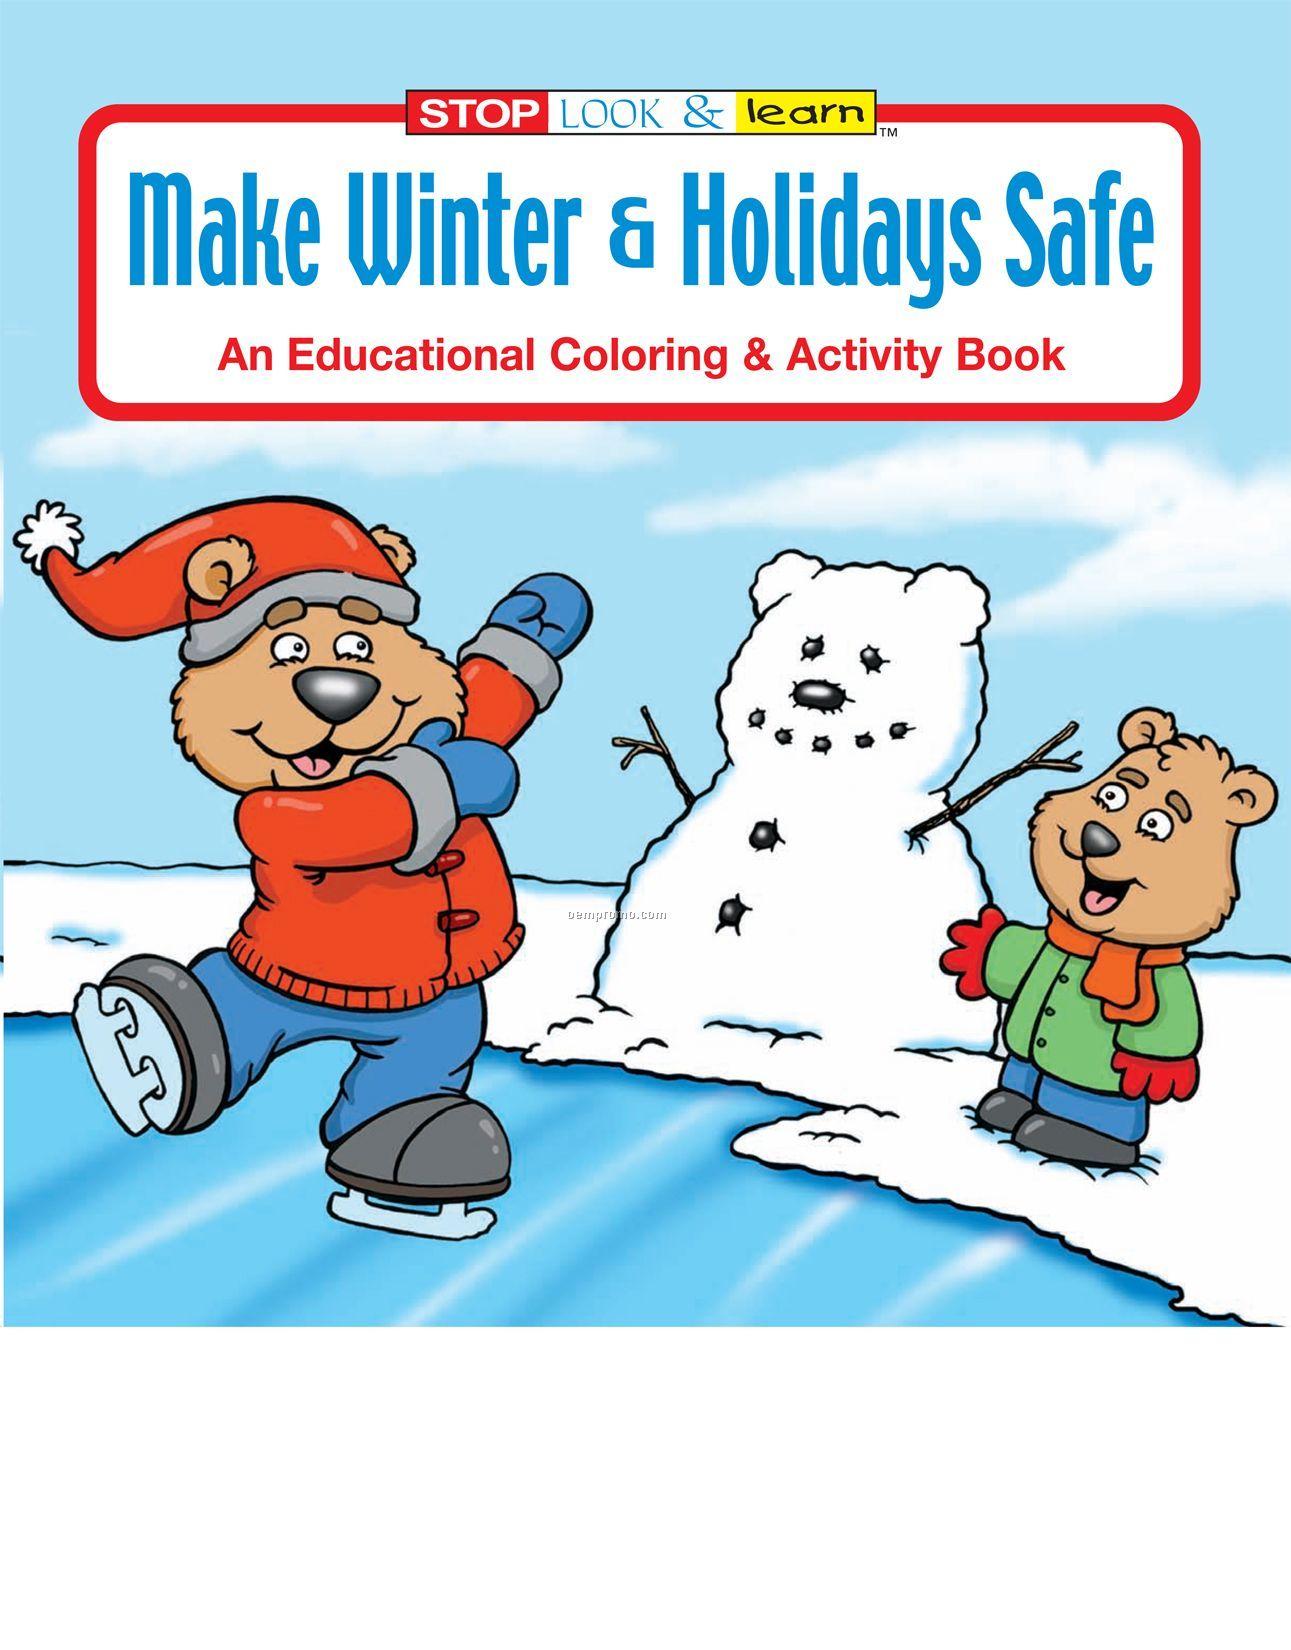 Make Winter & Holidays Safe Coloring Book